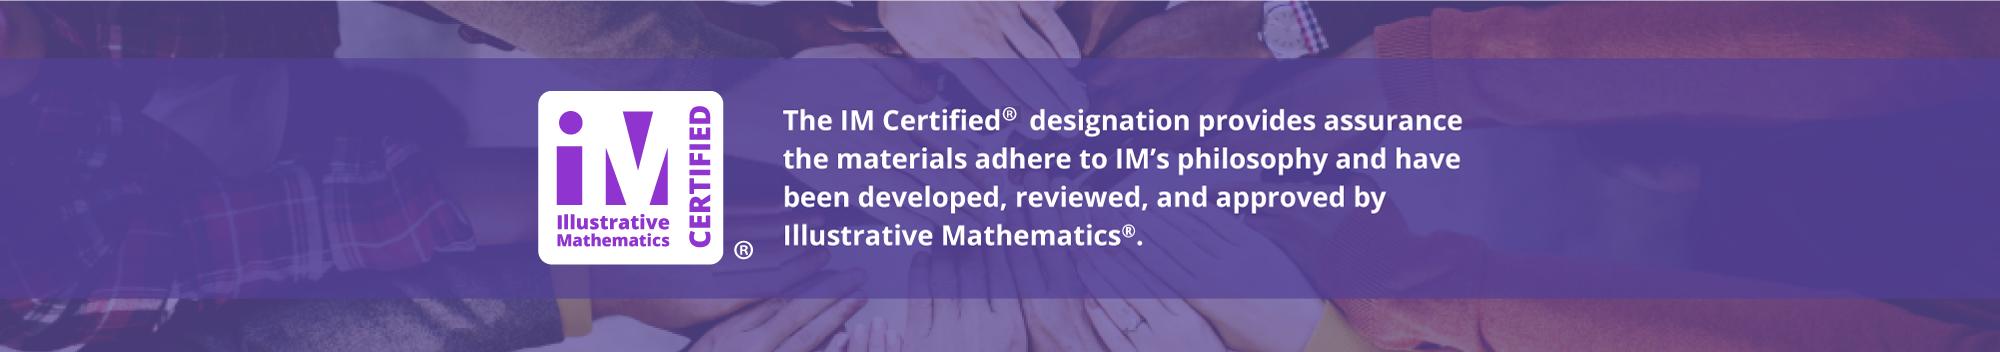 IM Certified logo